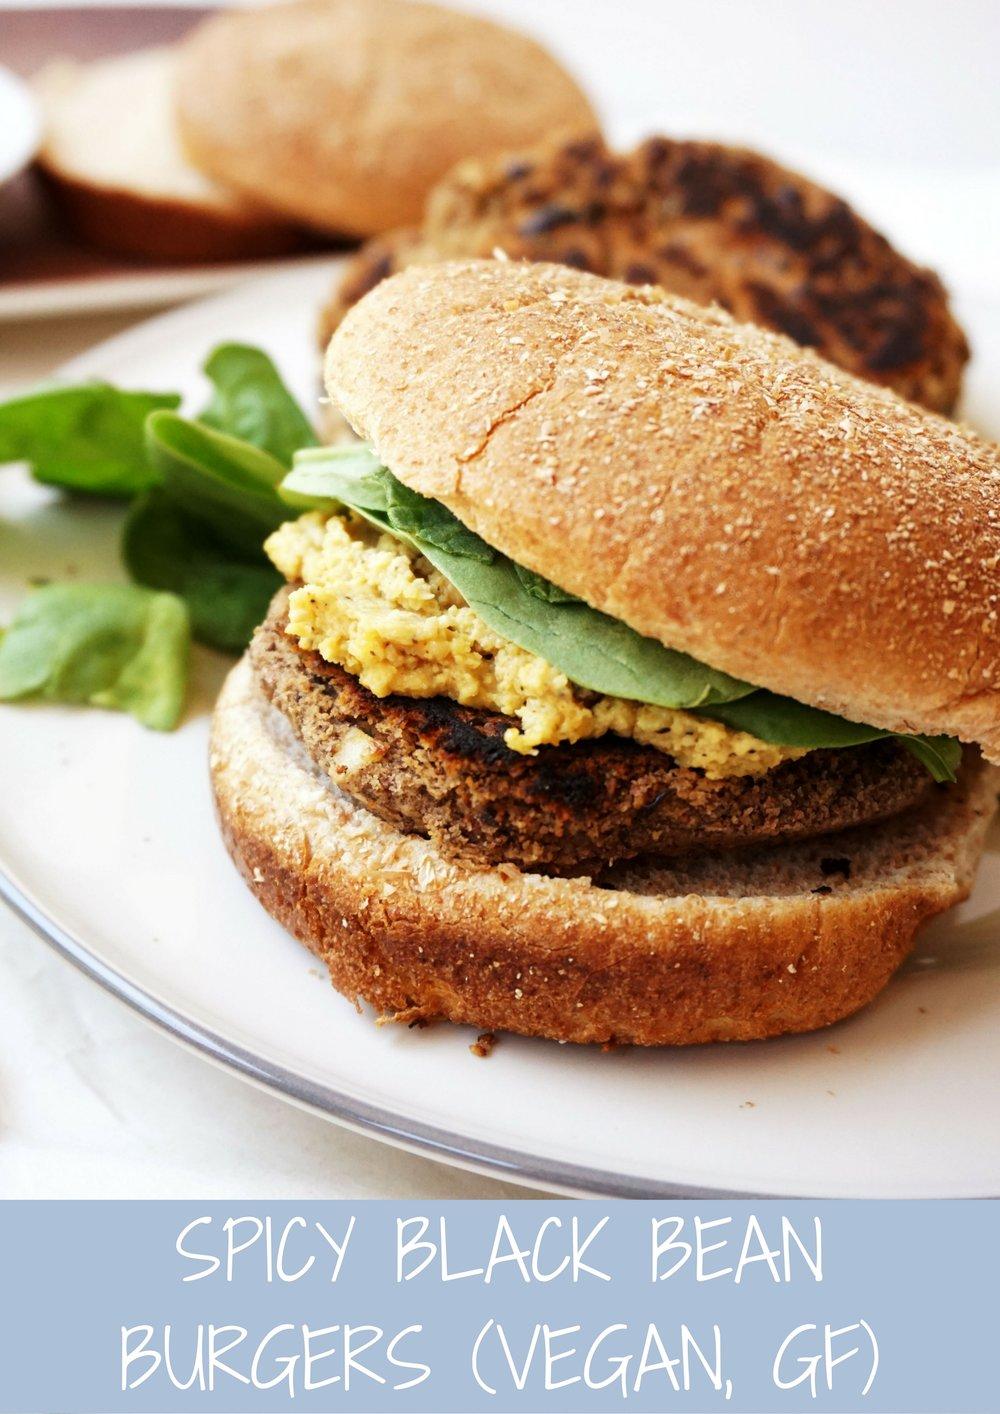 Spicy Black Bean Burgers (Vegan, GF)